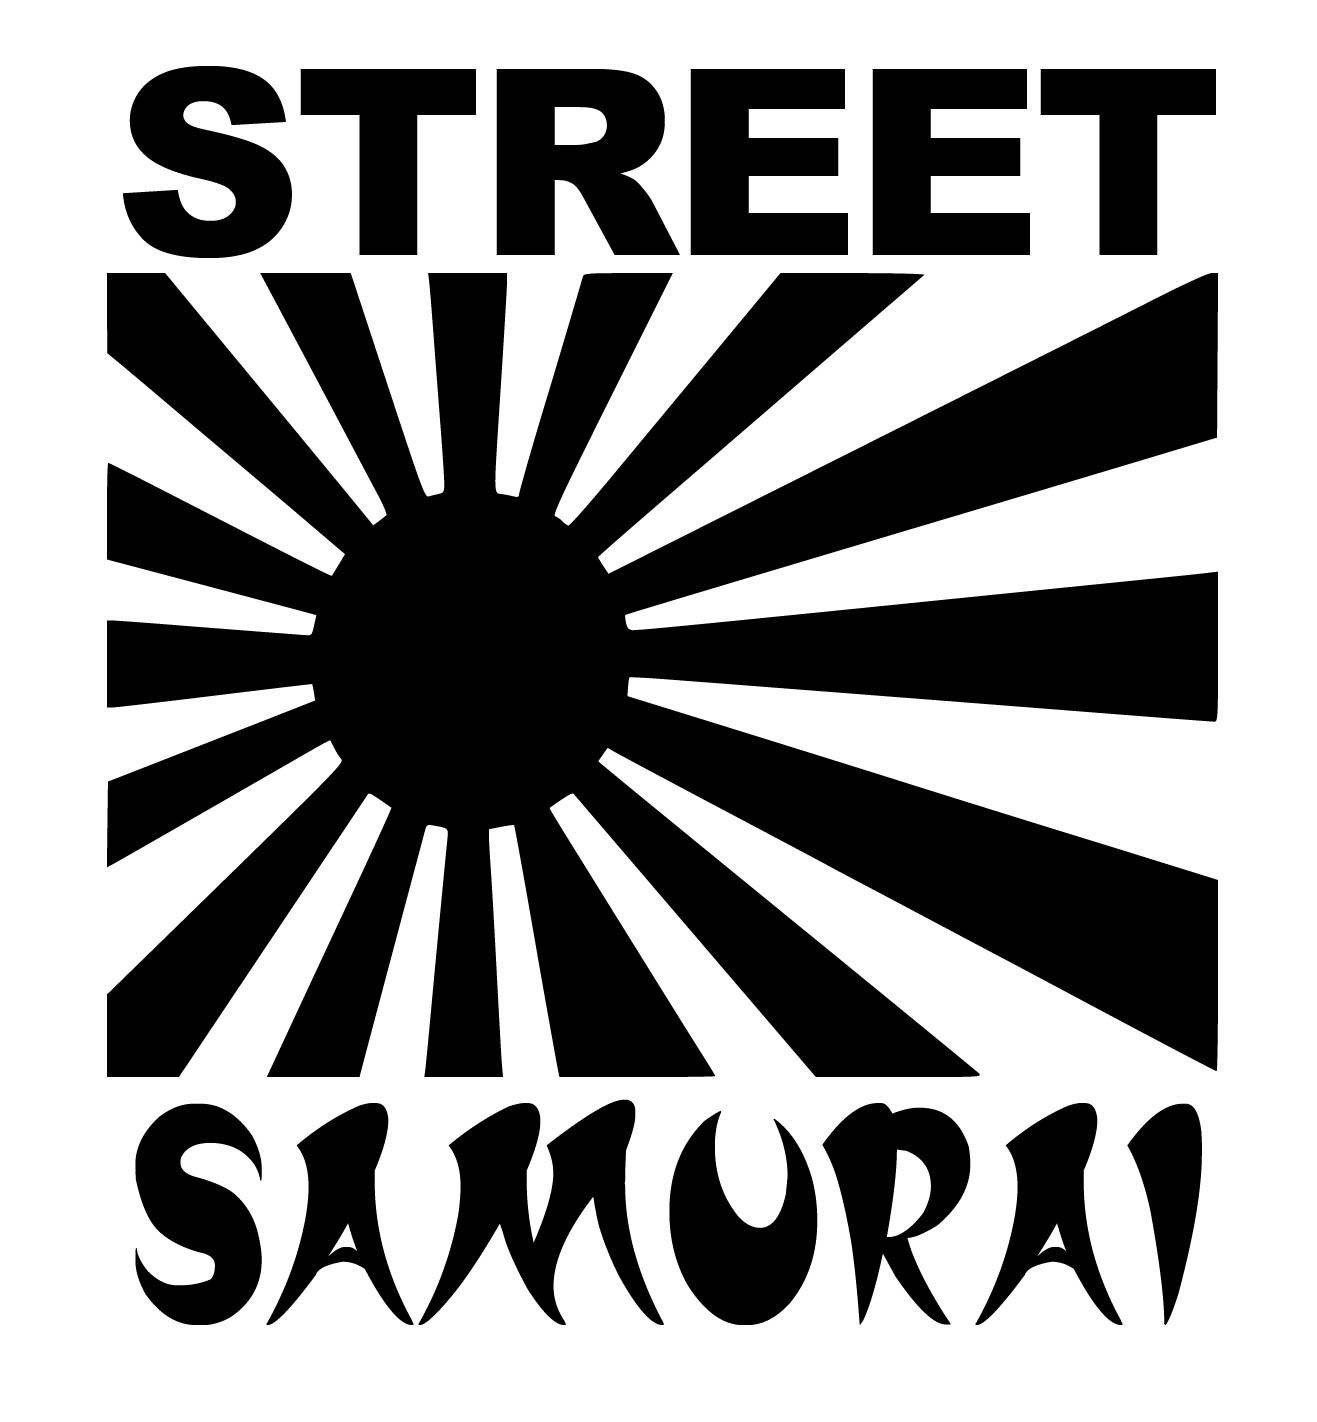 Street samurai drift japan jdm car window wall macbook notebook street samurai drift japan jdm car window wall macbook notebook laptop sticker decal biocorpaavc Image collections